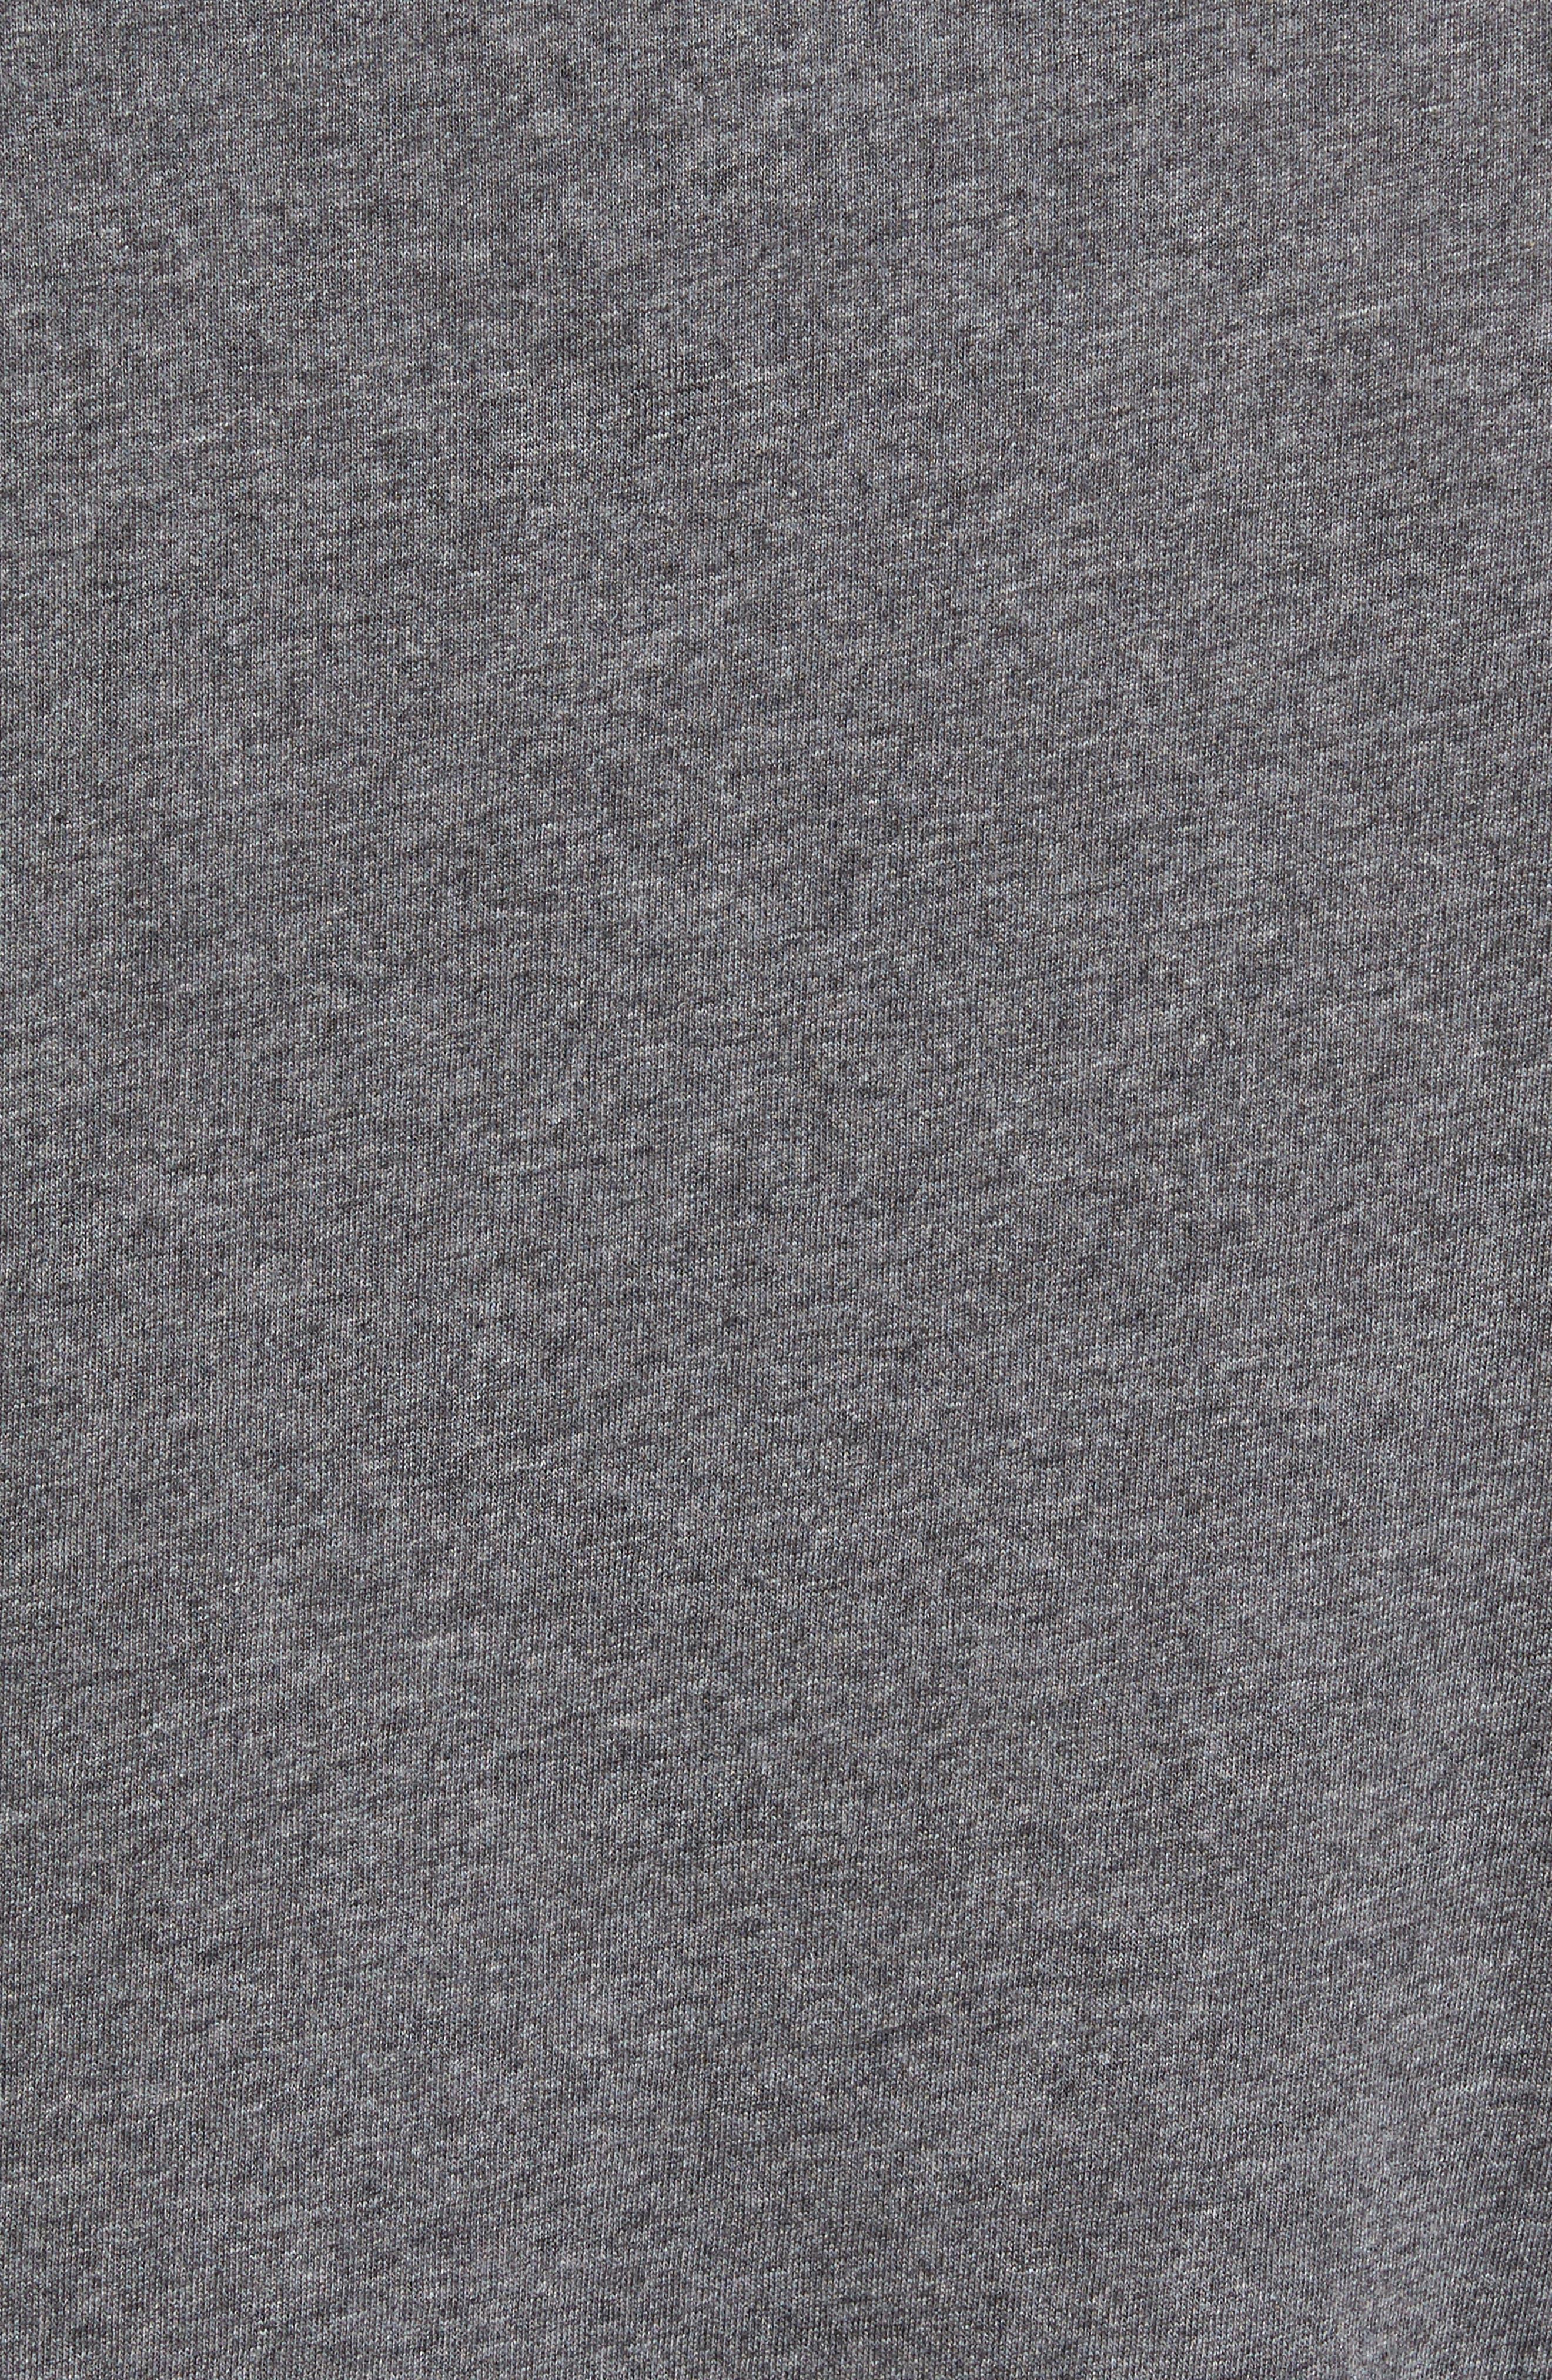 Long Sleeve Henley T-Shirt,                             Alternate thumbnail 5, color,                             020